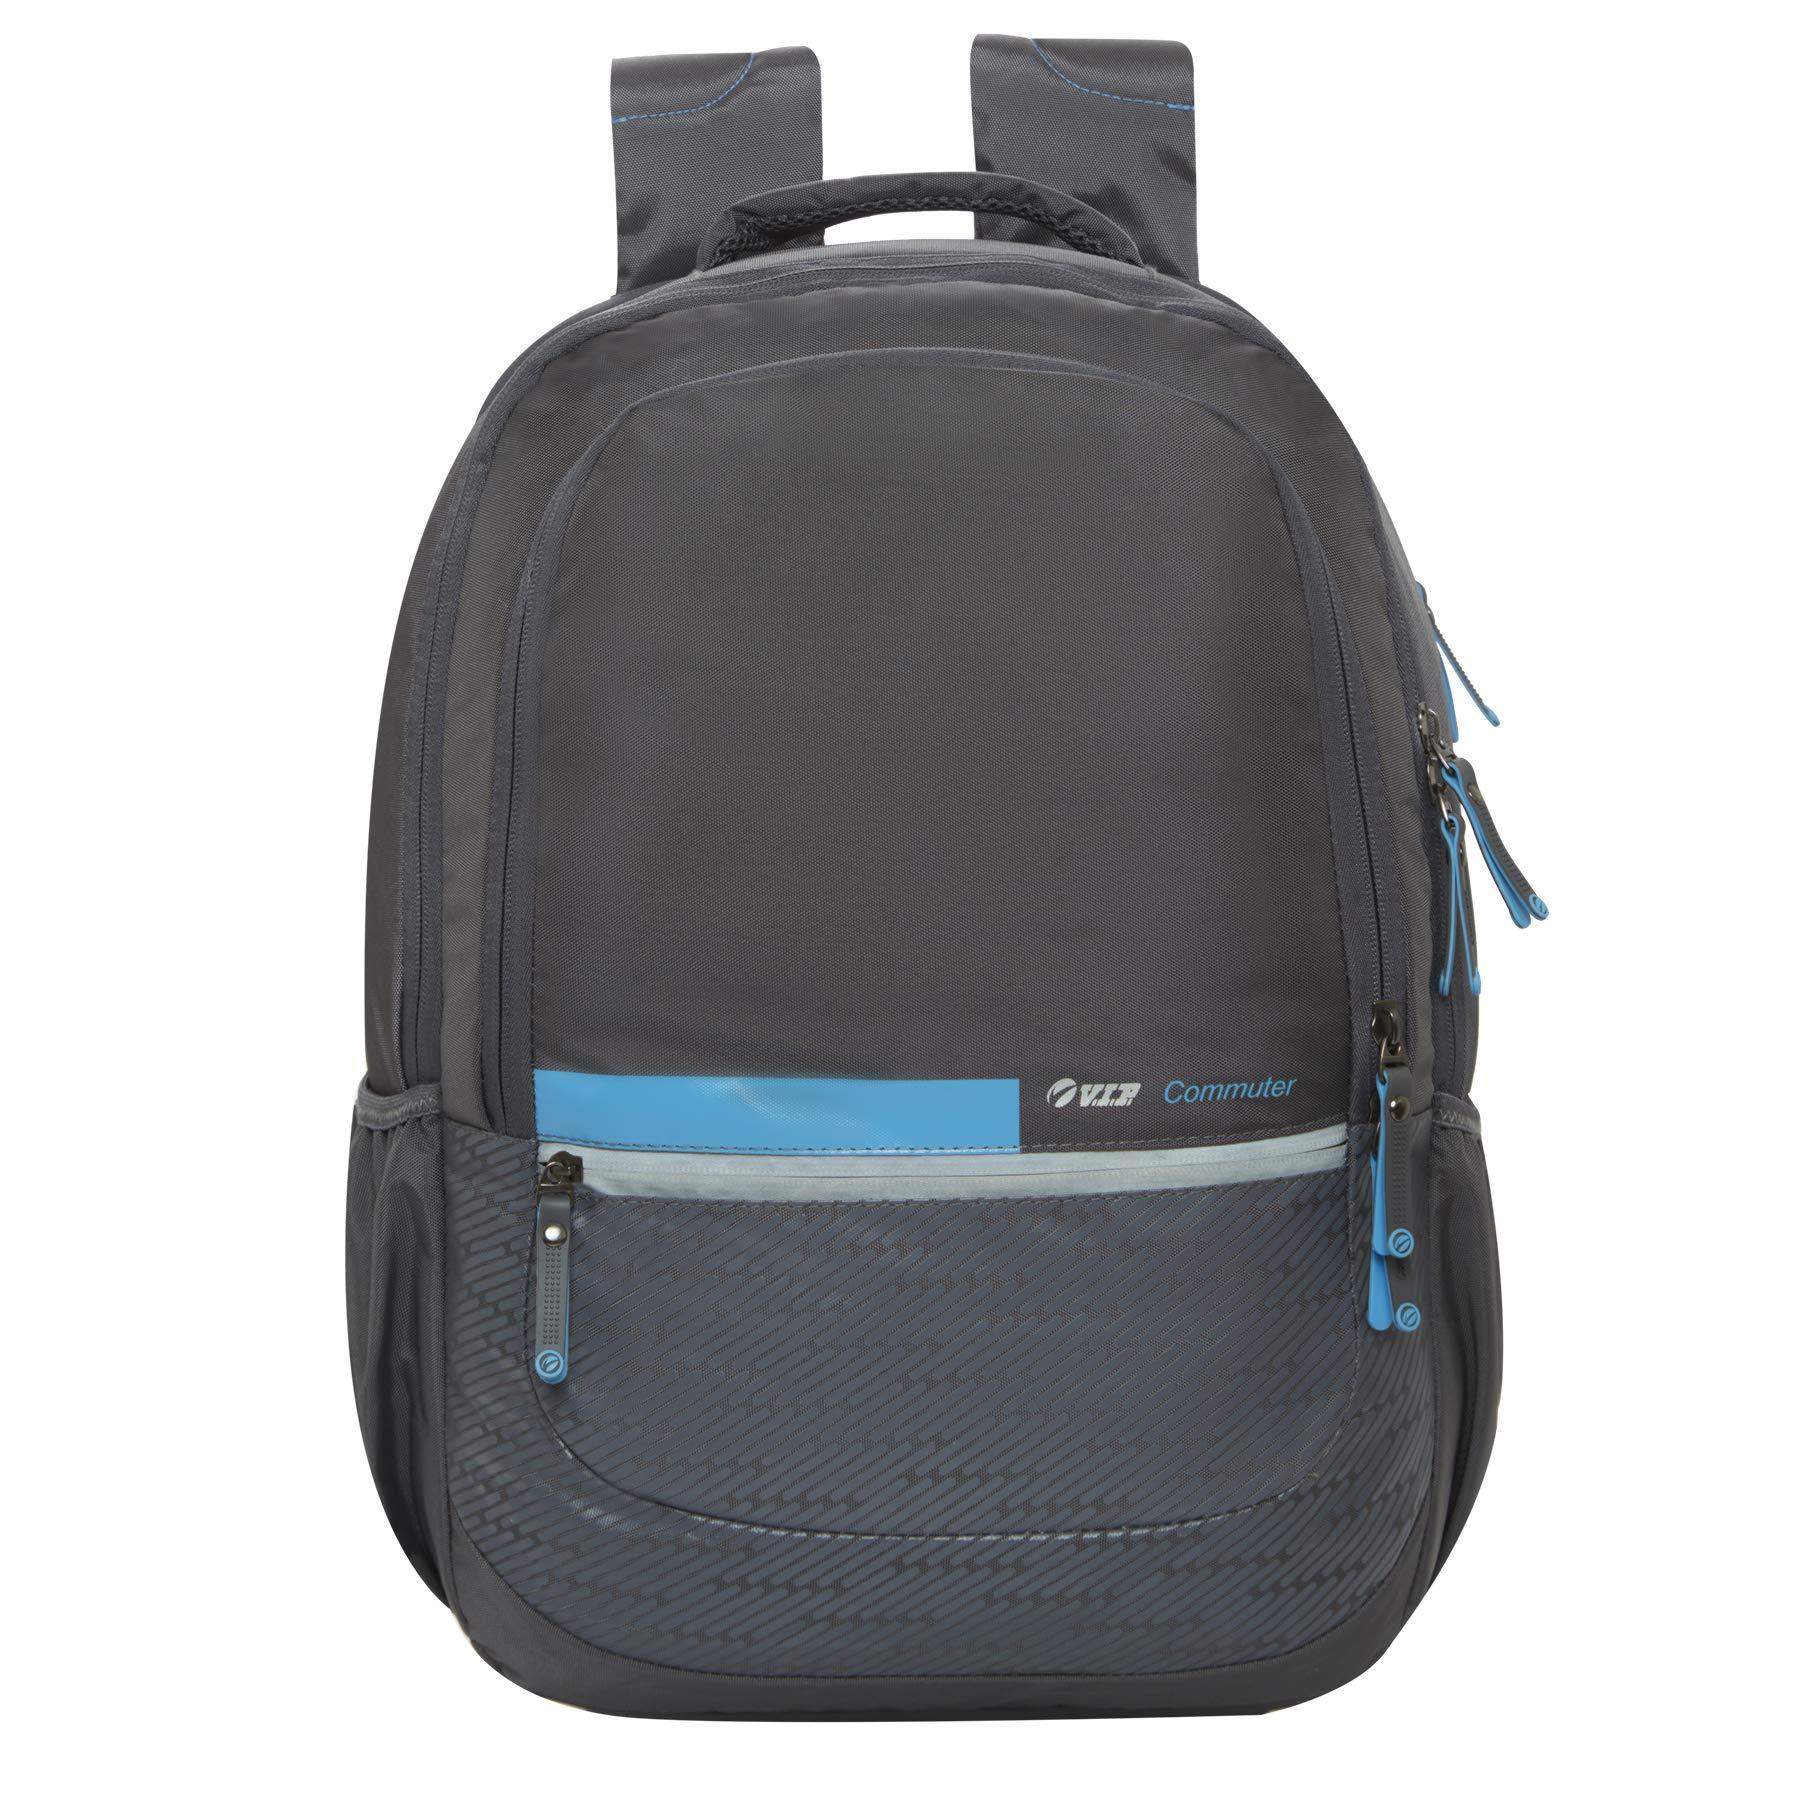 VIP Droid 02 Laptop Backpack 47 Grey (B07SZCBH6M) Amazon Price History, Amazon Price Tracker